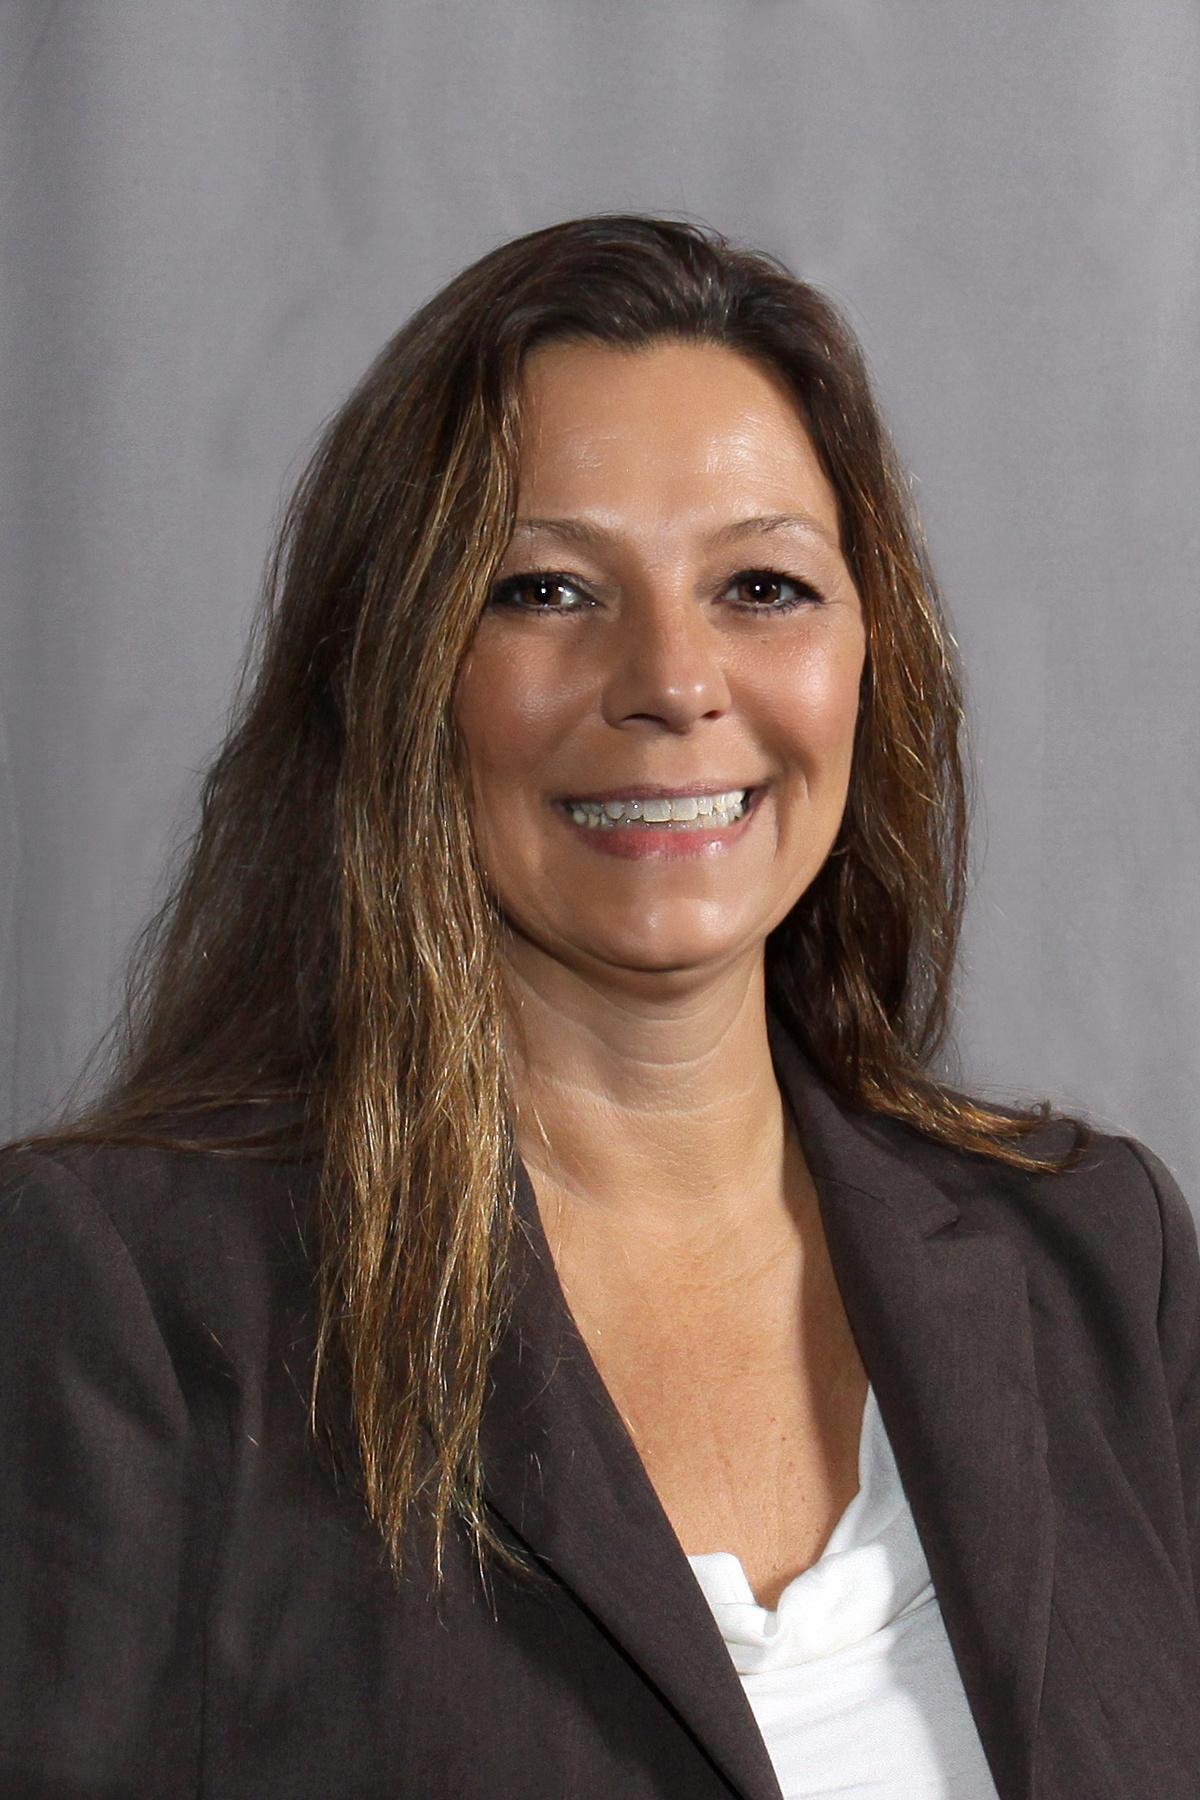 Brenda Maks